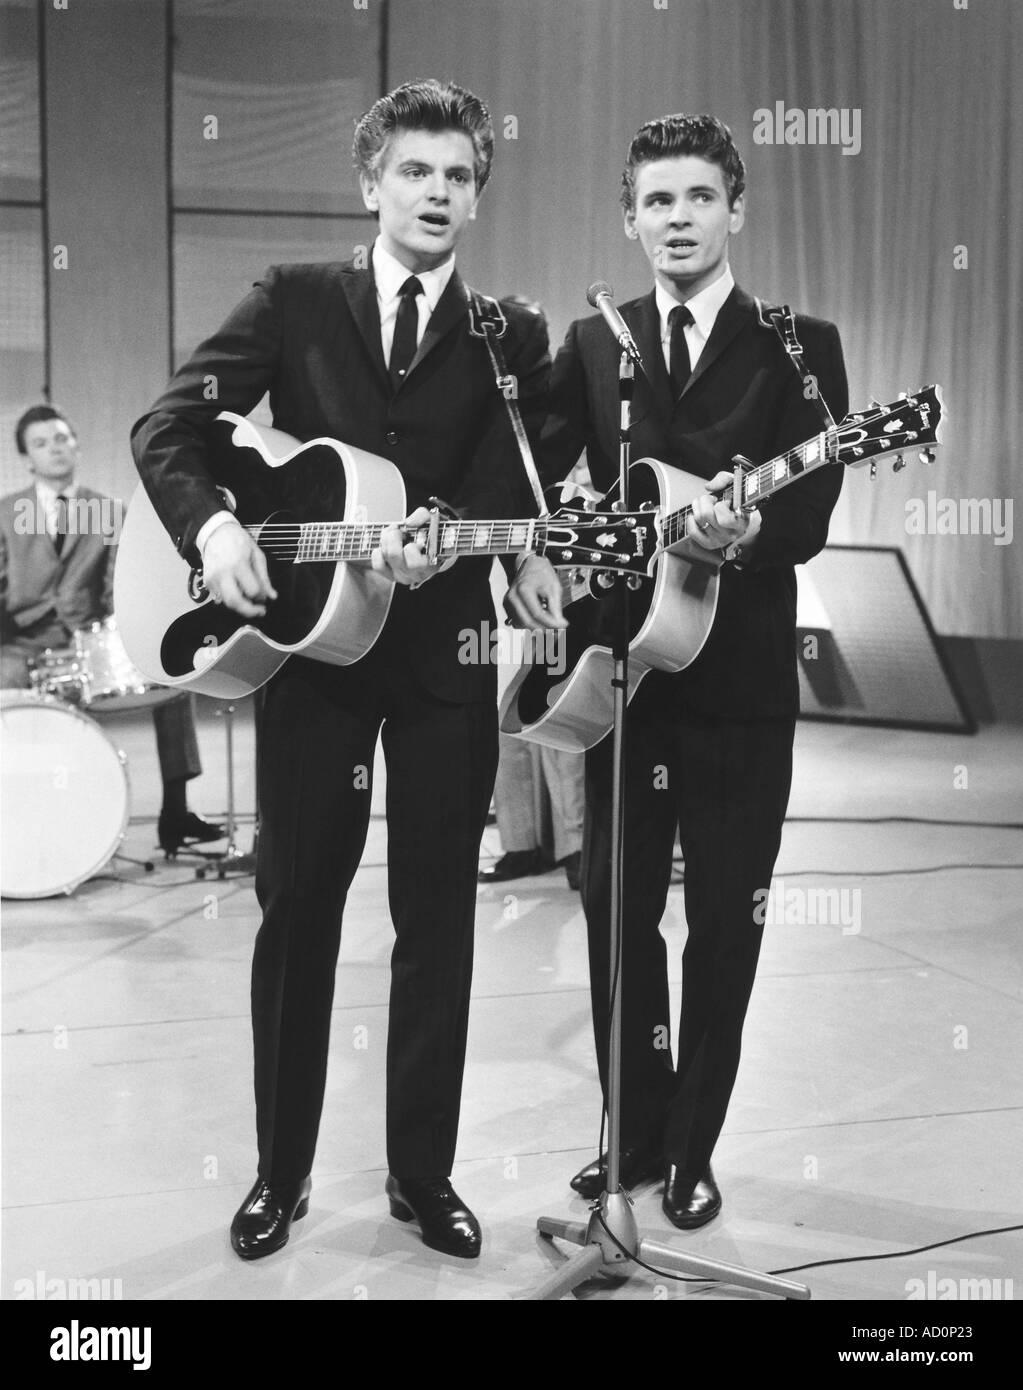 Everly Brothers. Photo by Harry Hammond. UK, 1961-63 - Stock Image